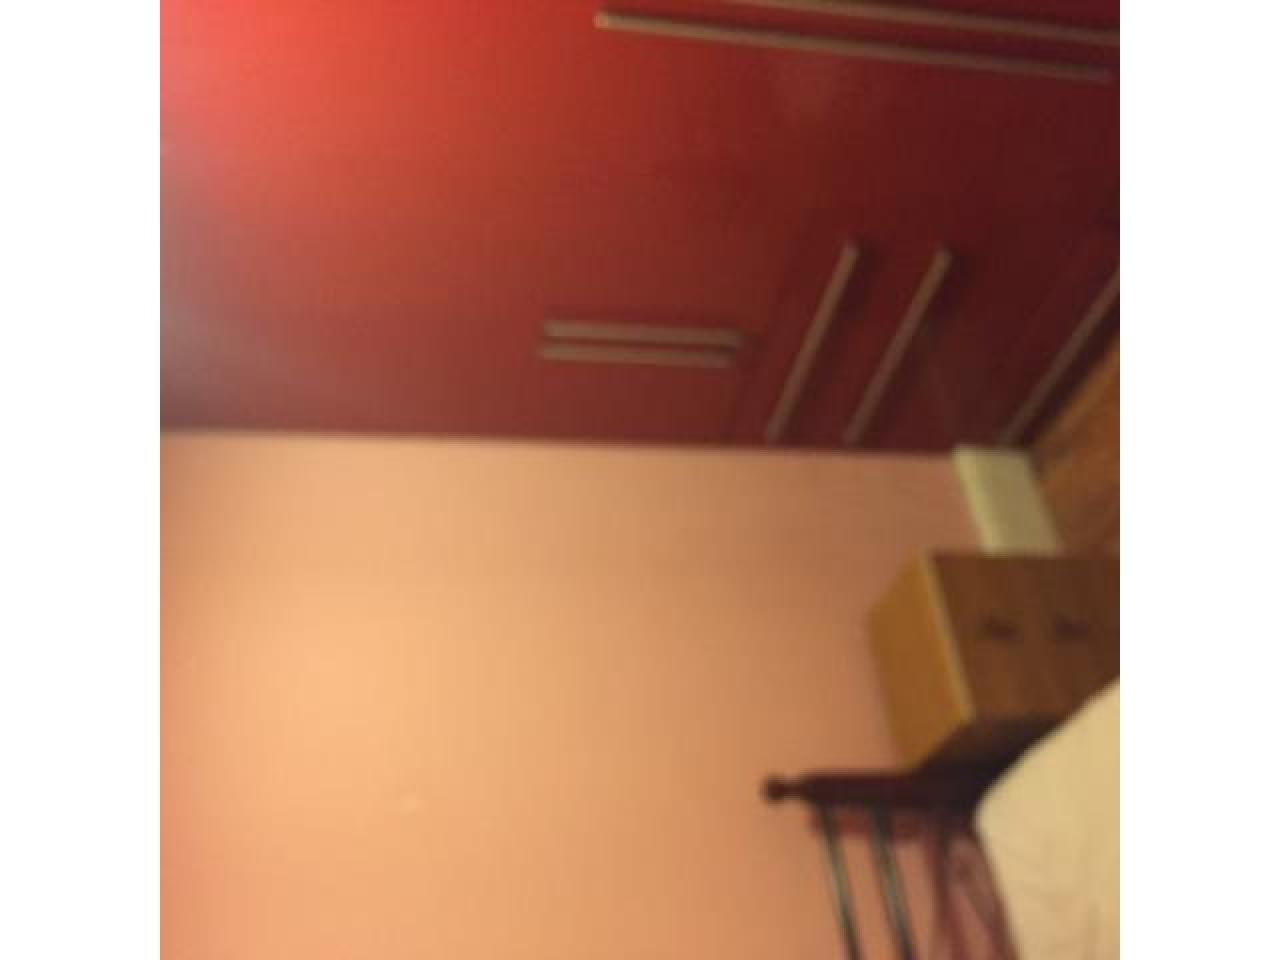 Cдаю single комнатy хорошем доме в PLAISTOW и REDBRIDGE station - 5